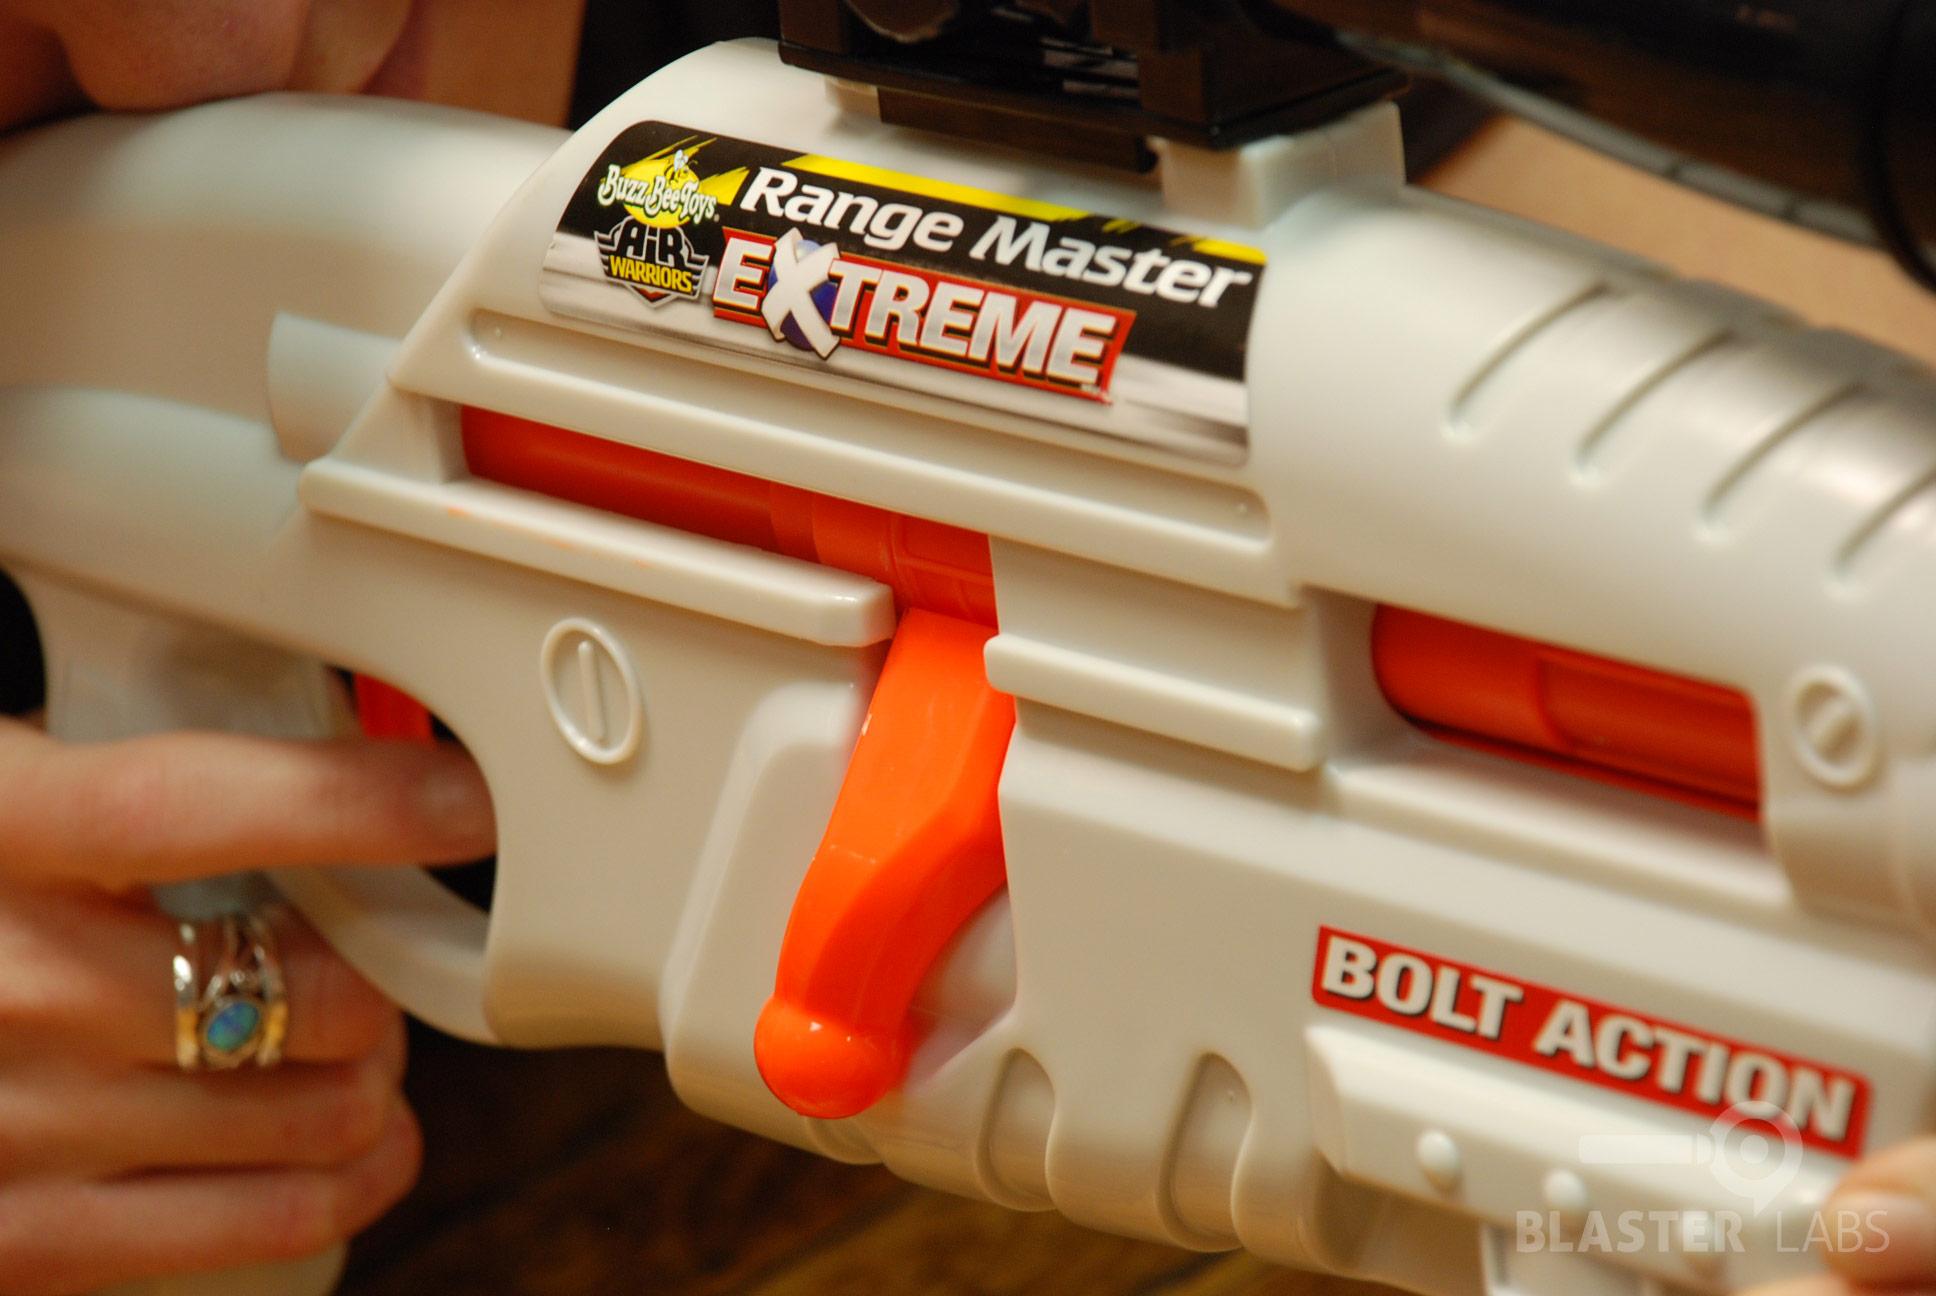 Review Buzz Bee Air Warriors Extreme Range Master Blaster Hub